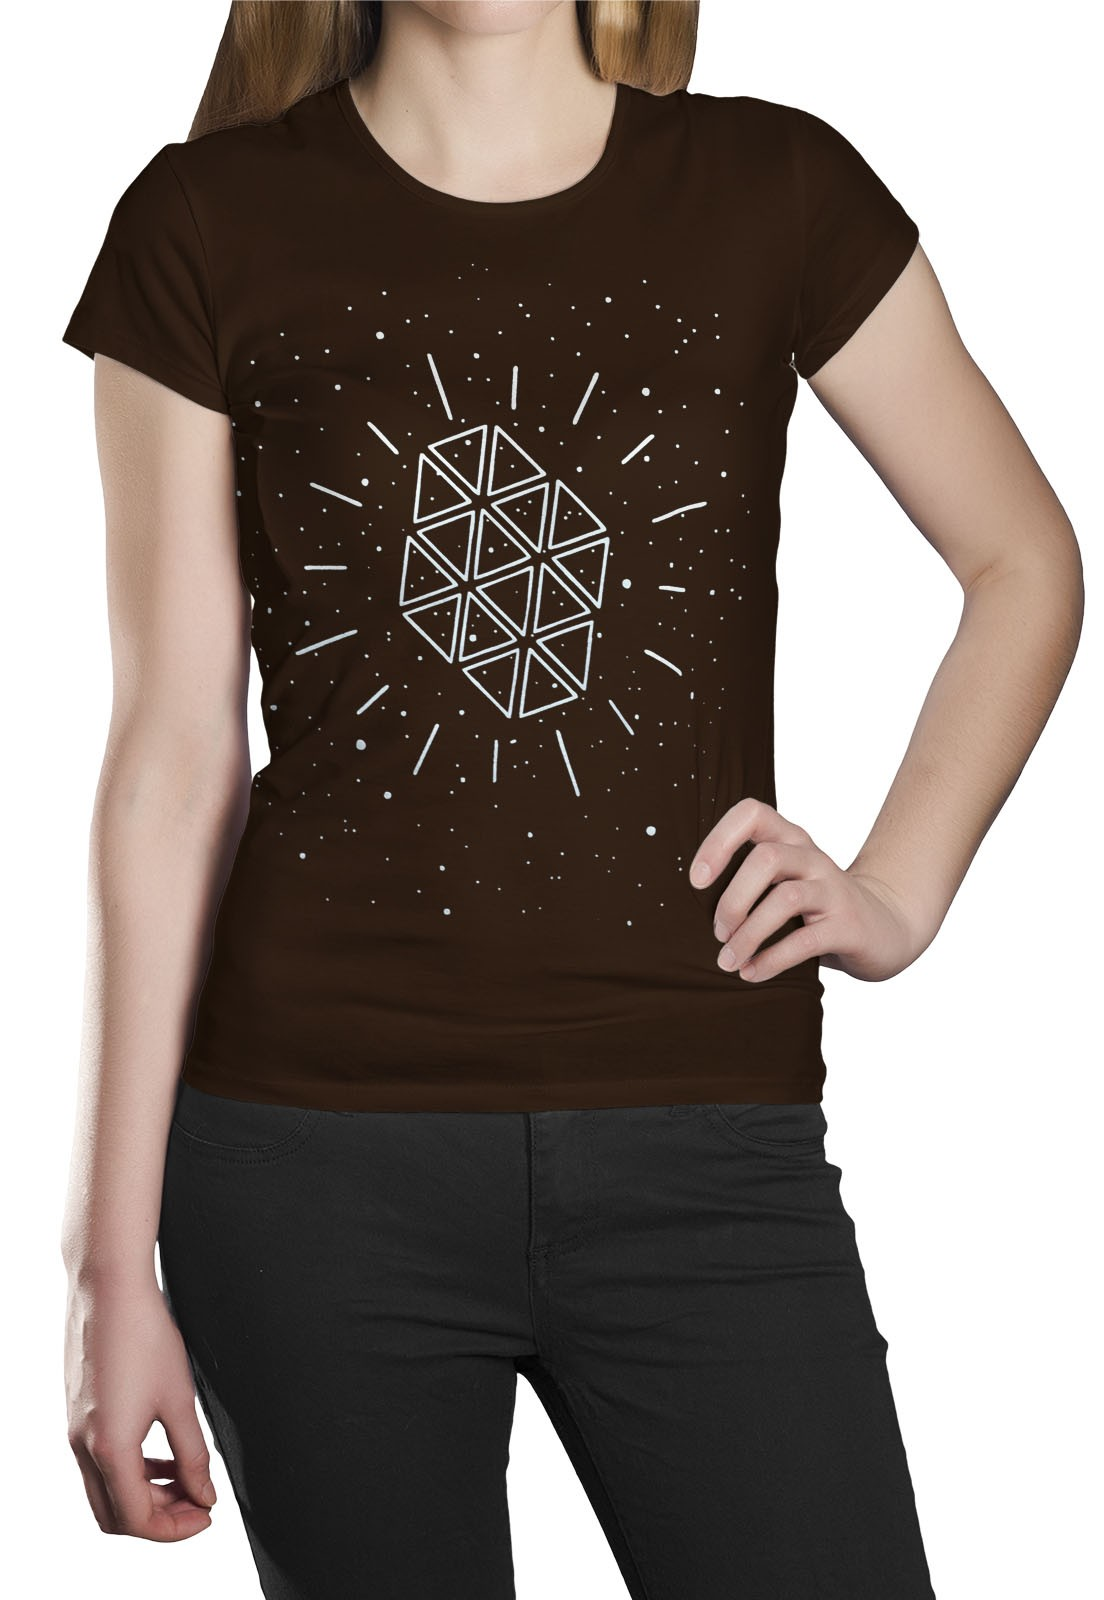 Camiseta HShop Galáxia Marrom  - HShop